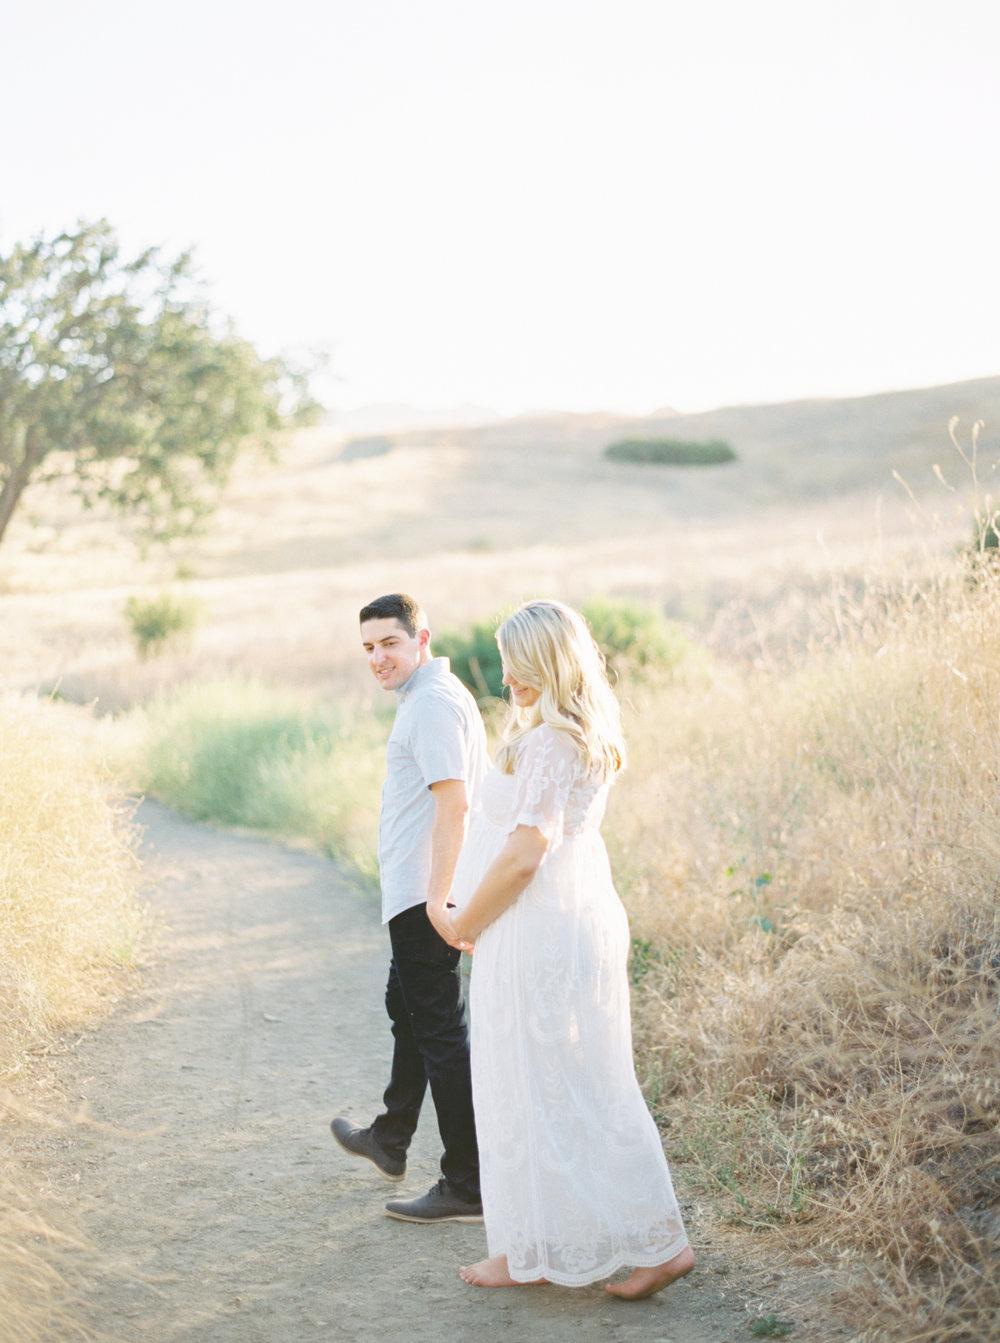 Rachel Owens Photography - Malibu Creek - Film Photography-18.jpg